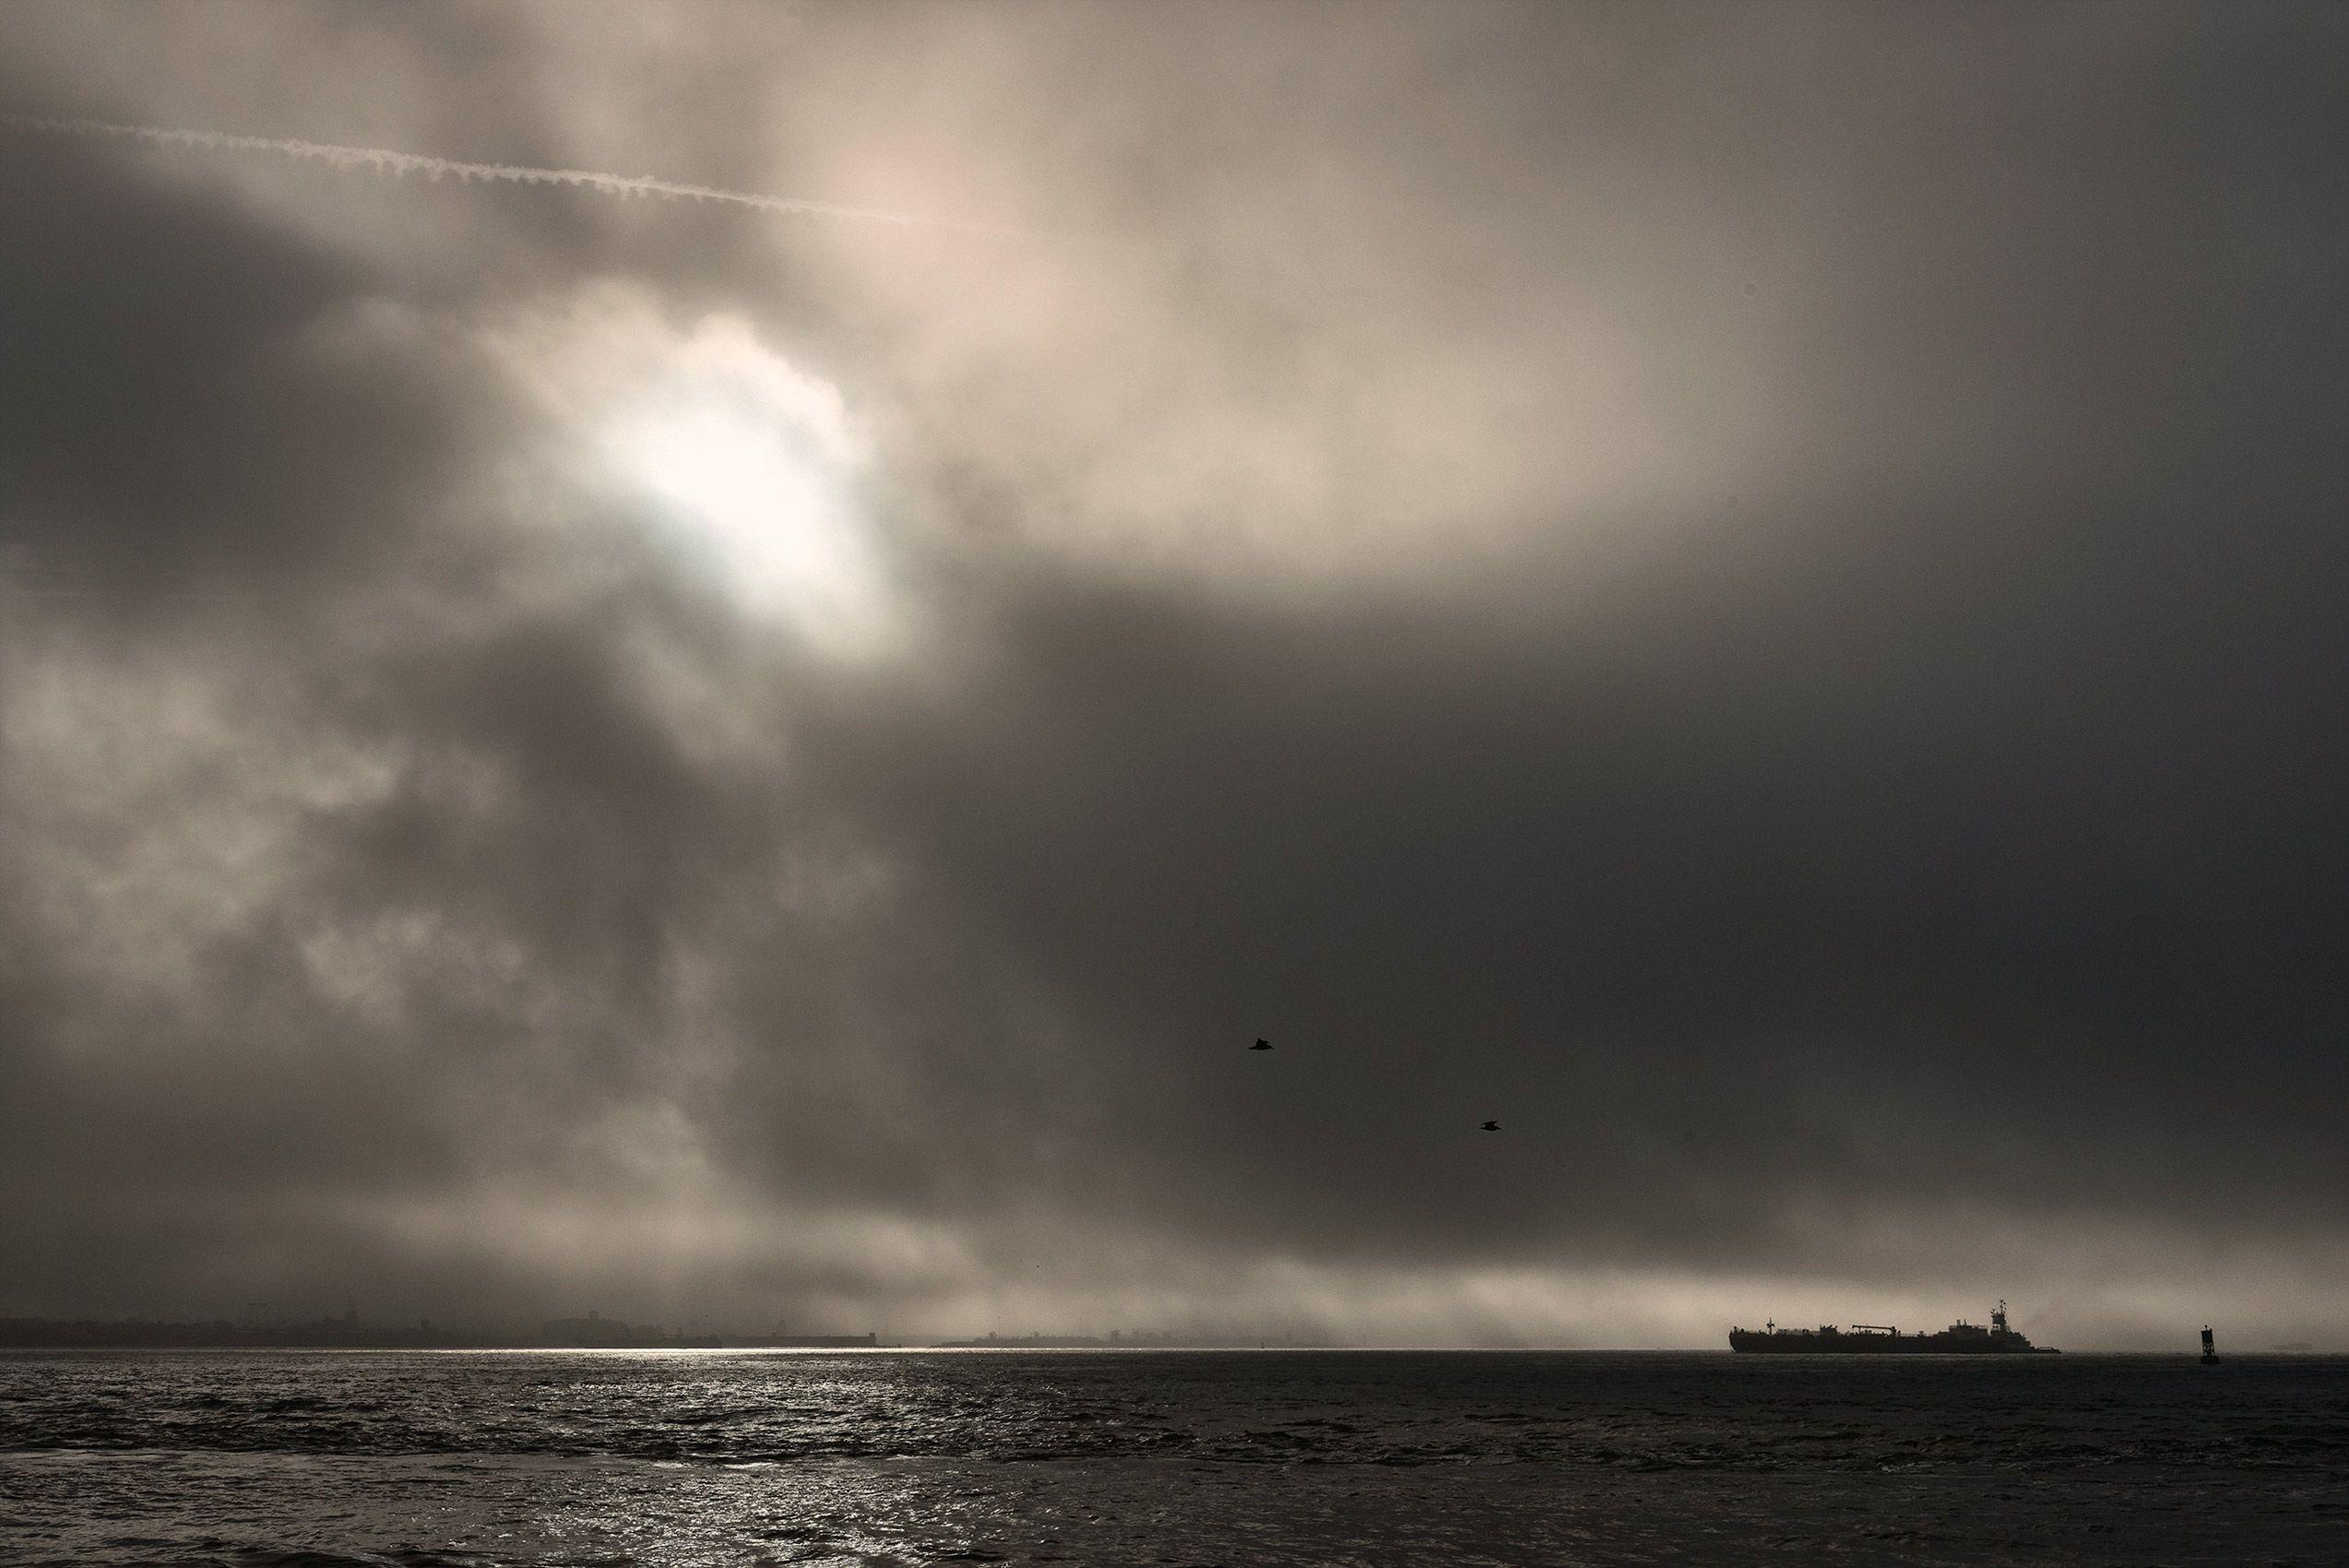 Morning-Sea-transportation-containership-cargo-HenrikOlundPhotographyglobaltrade.jpg